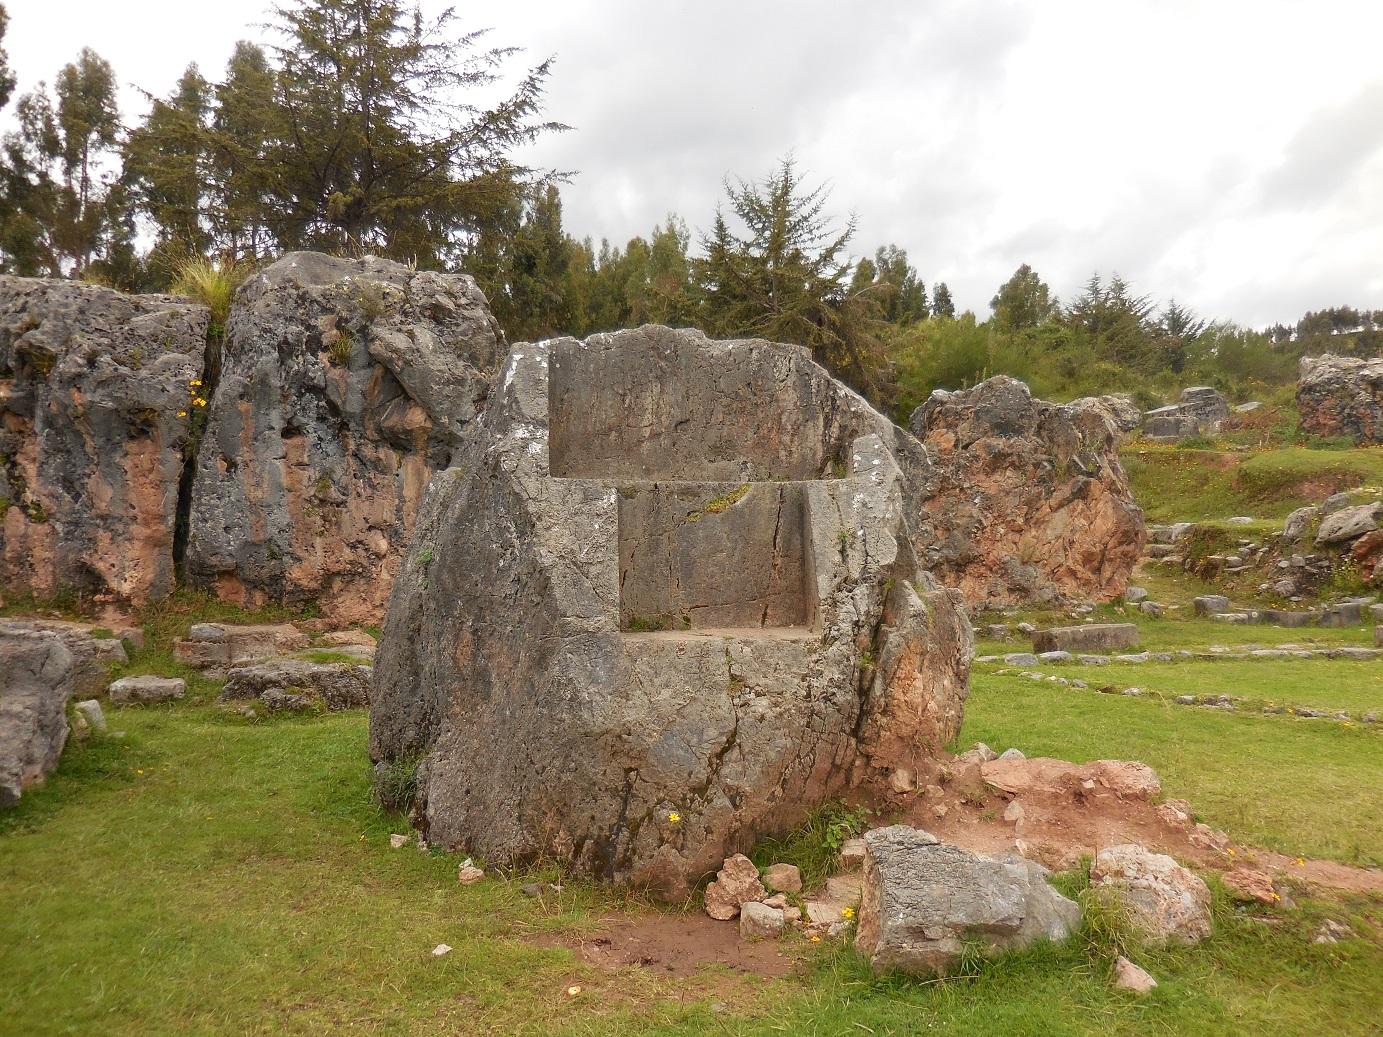 Saqsaywaman Statue stone or seat?